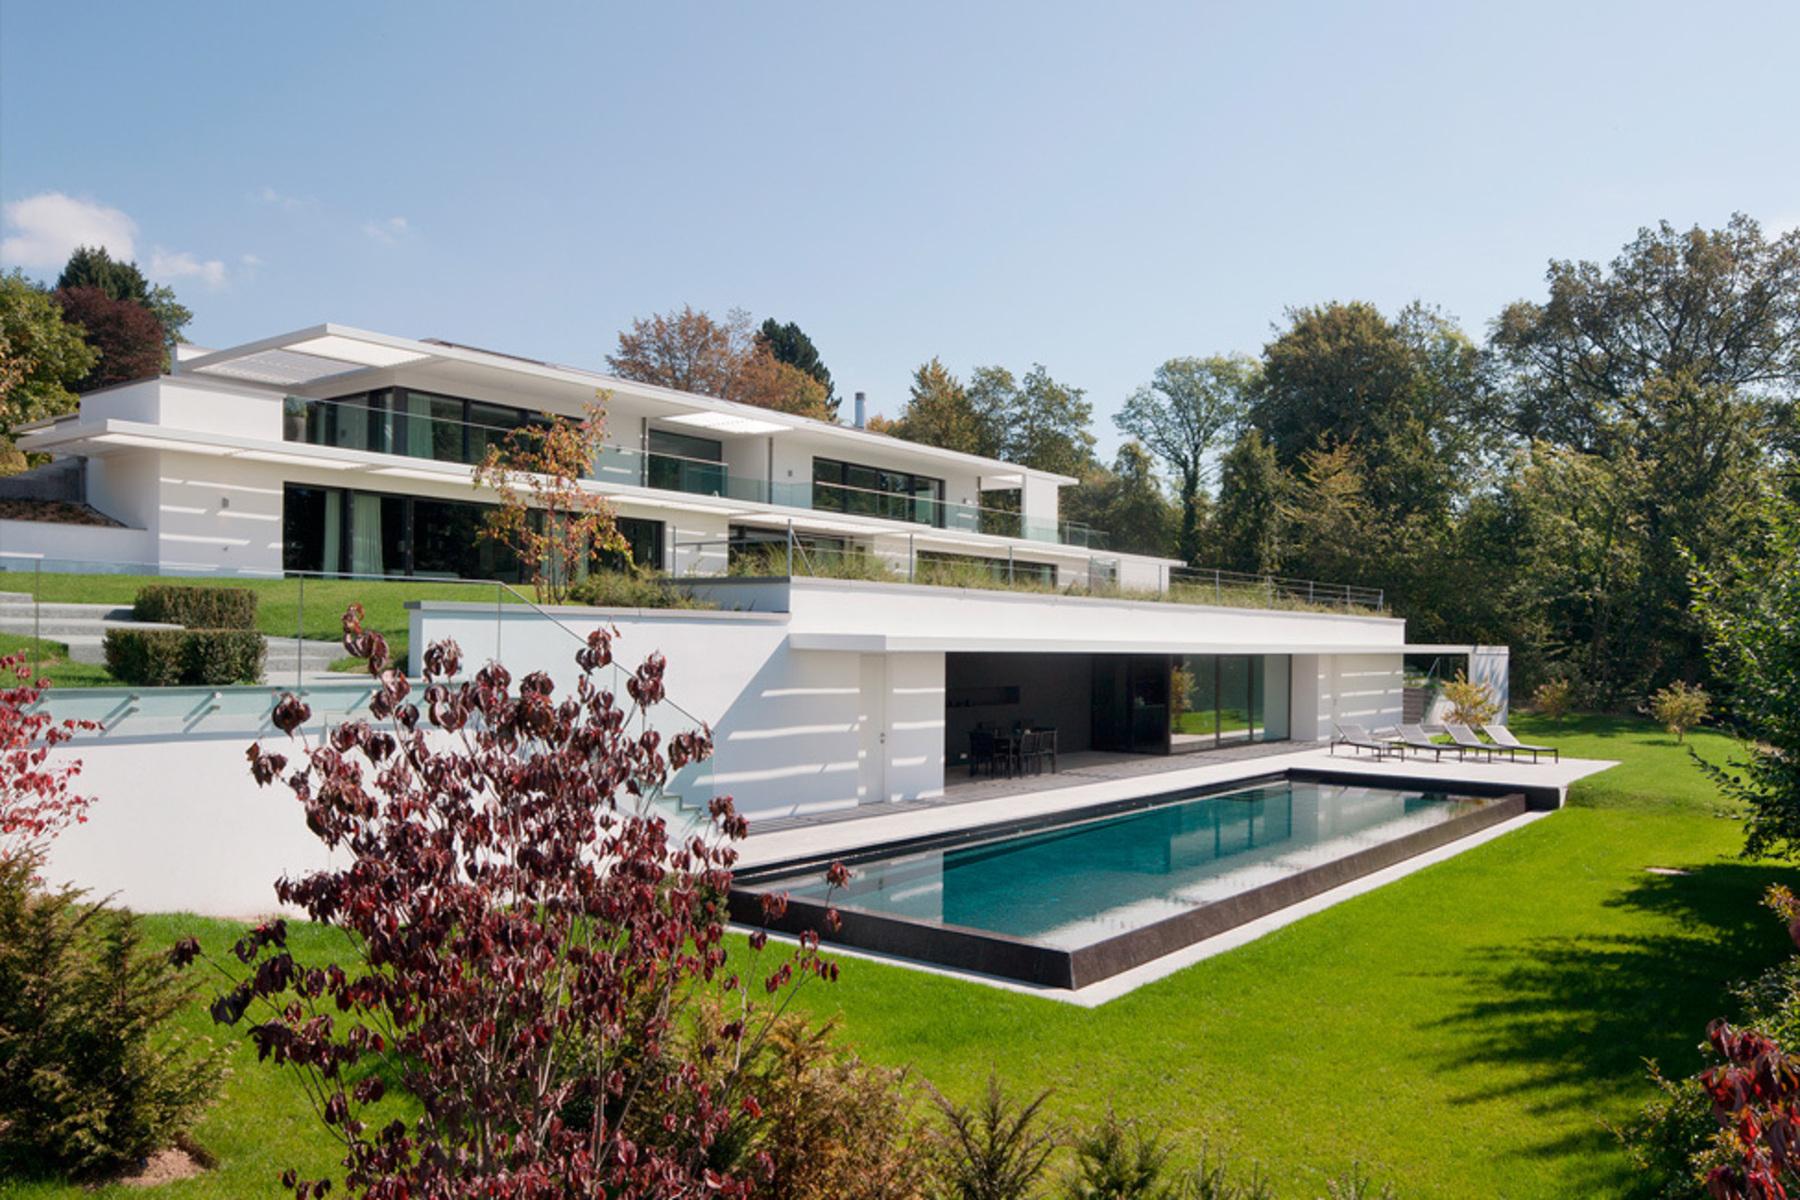 Single Family Home for Sale at Spectacular 10 room architect-built house Epalinges Epalinges, Vaud, 1066 Switzerland